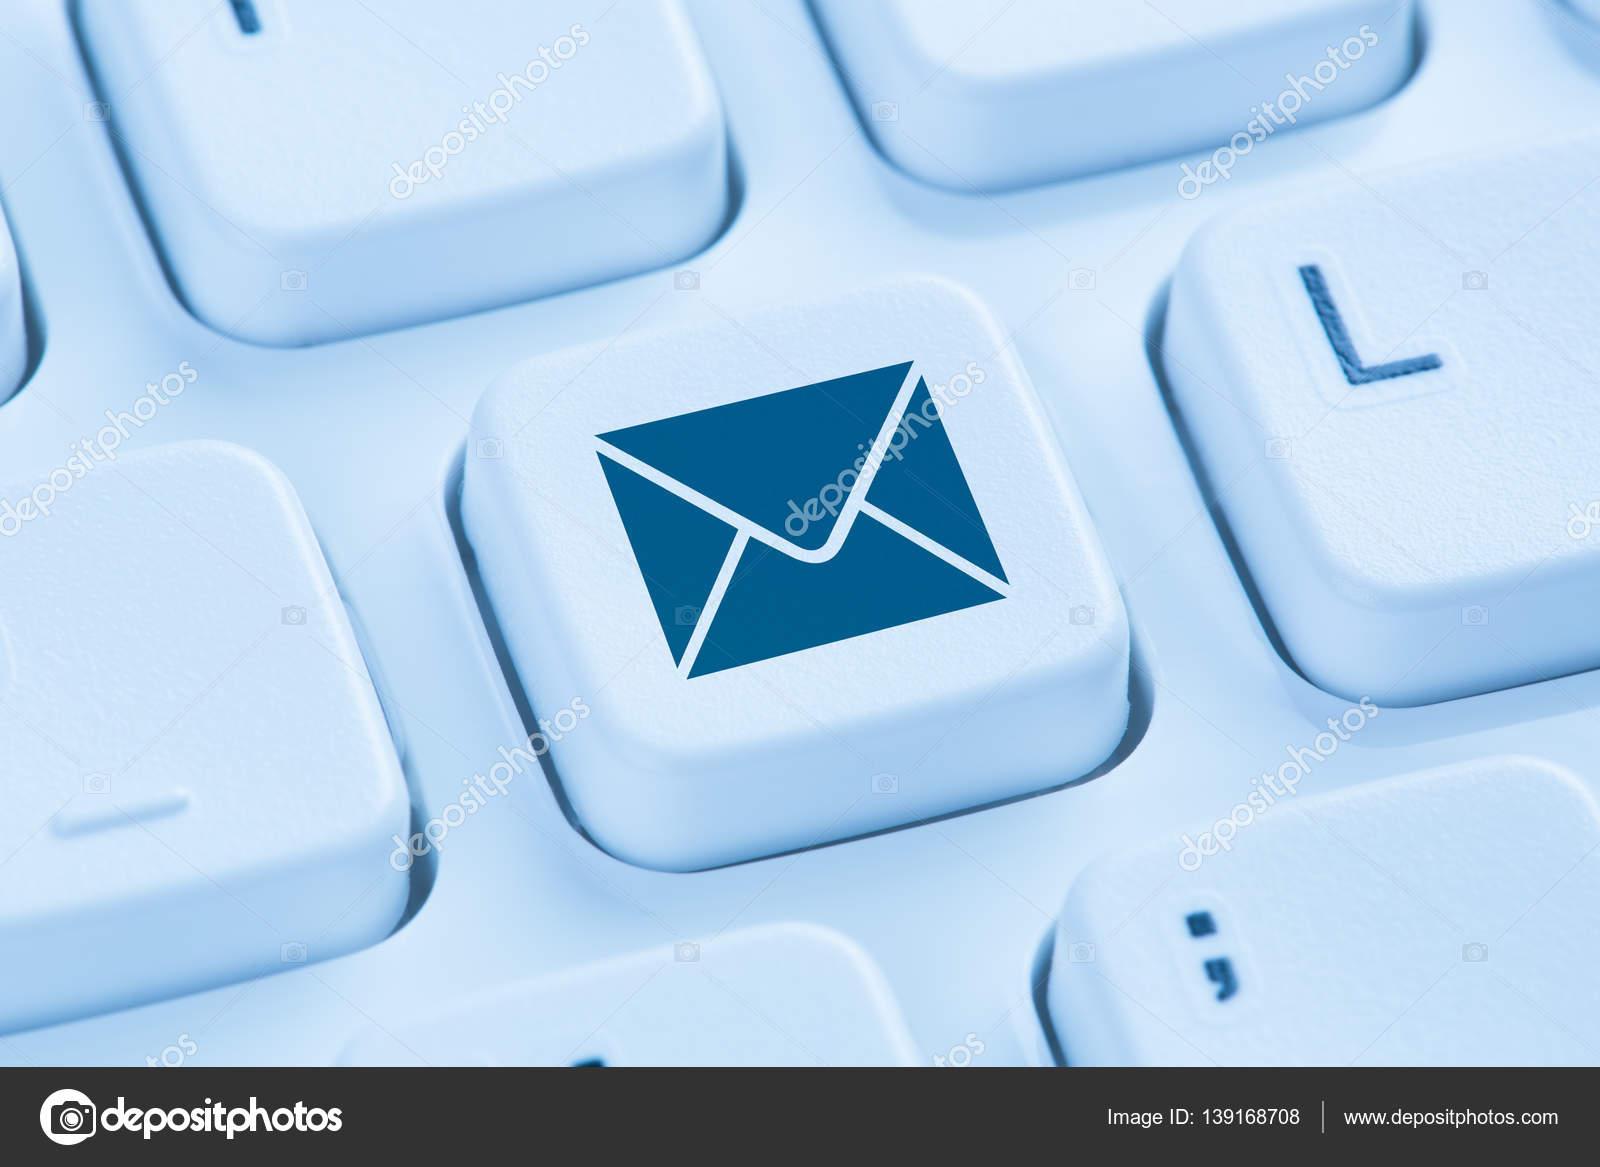 dating ιστοσελίδα Αναζήτηση ηλεκτρονικού ταχυδρομείου 17 και 23 ετών dating